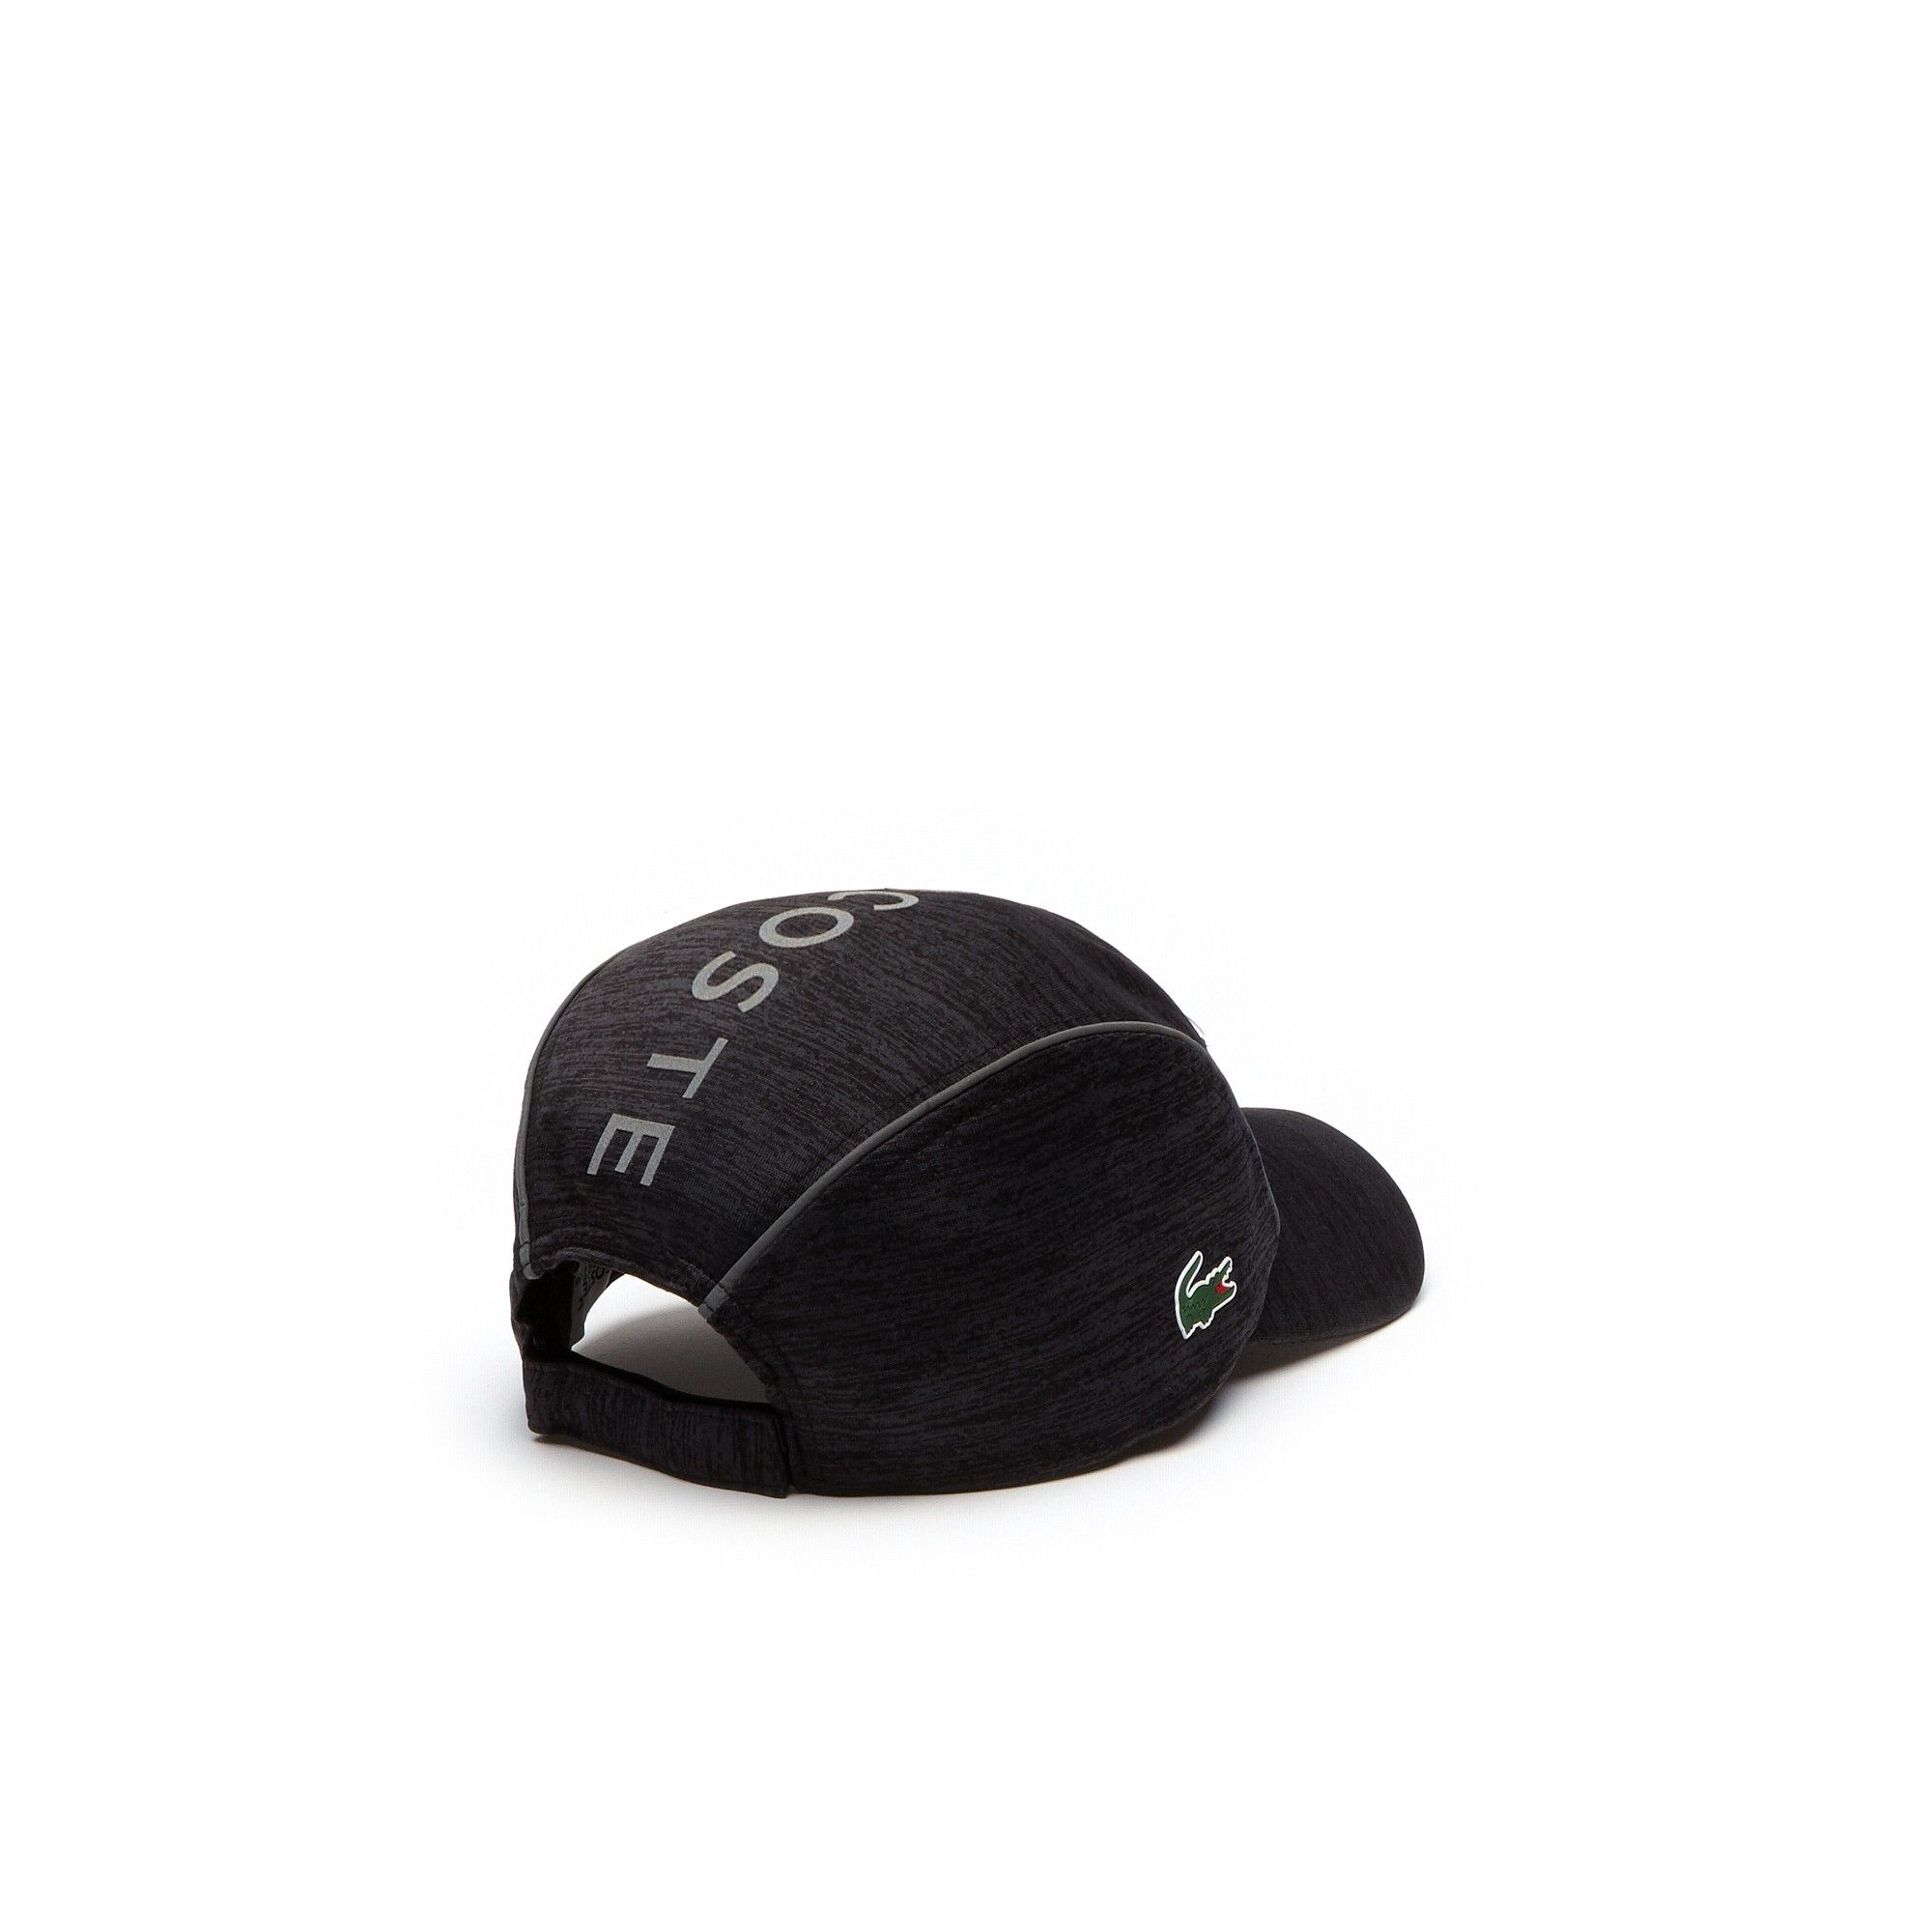 360b126a126d Lacoste Men's Sport Tennis Jersey & Metallic Mesh Cap - Black/Black ...